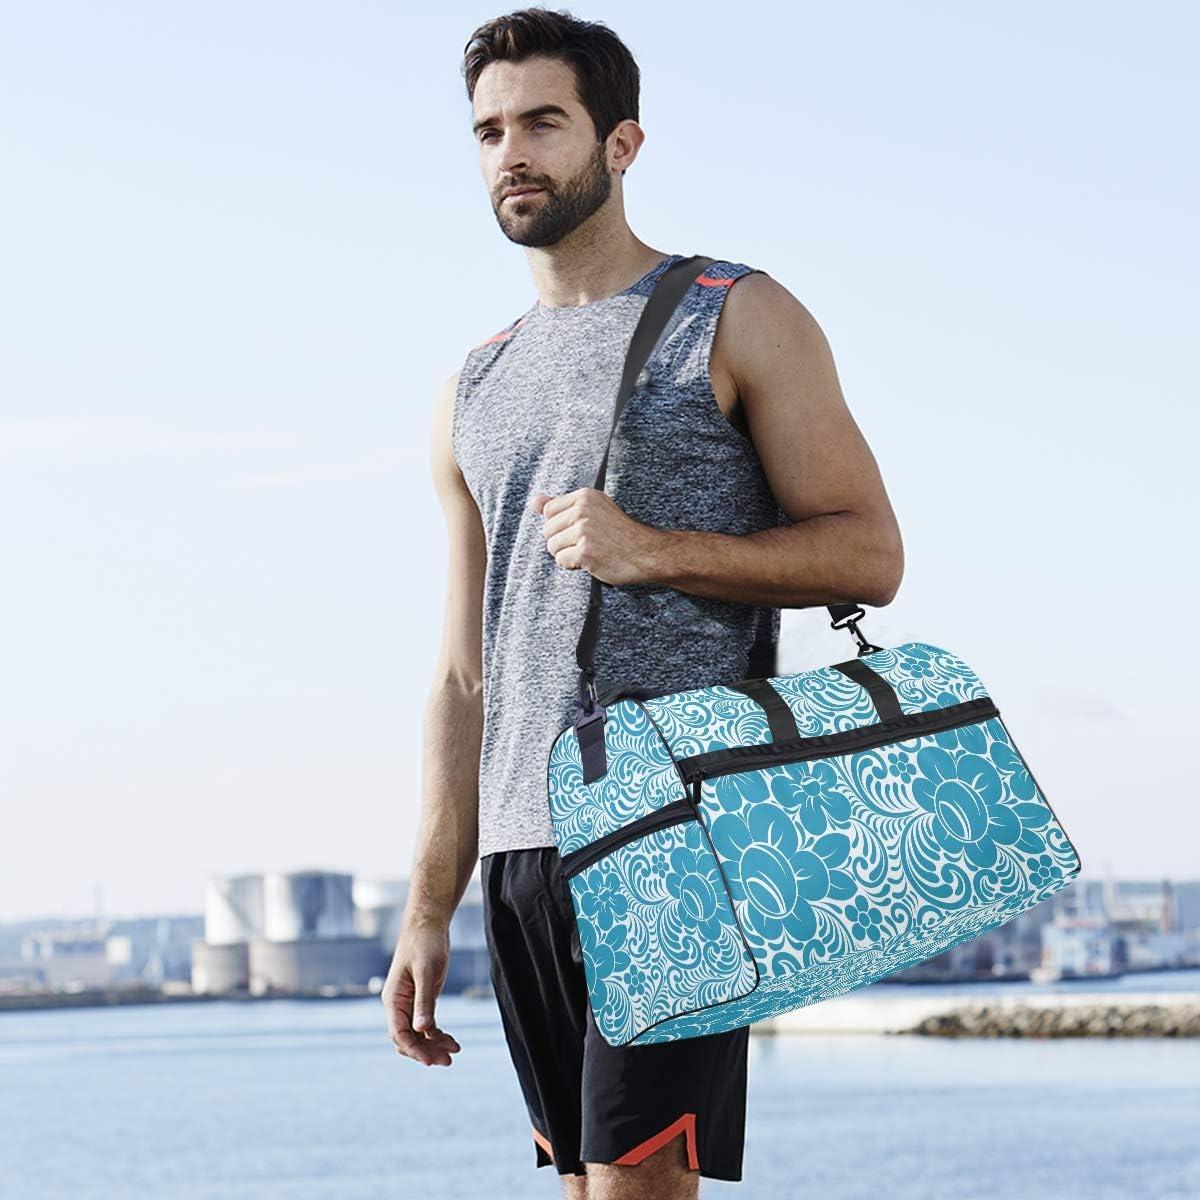 FANTAZIO Blue Floral Pattern Sports Duffle Bag Gym Bag Travel Duffel with Adjustable Strap